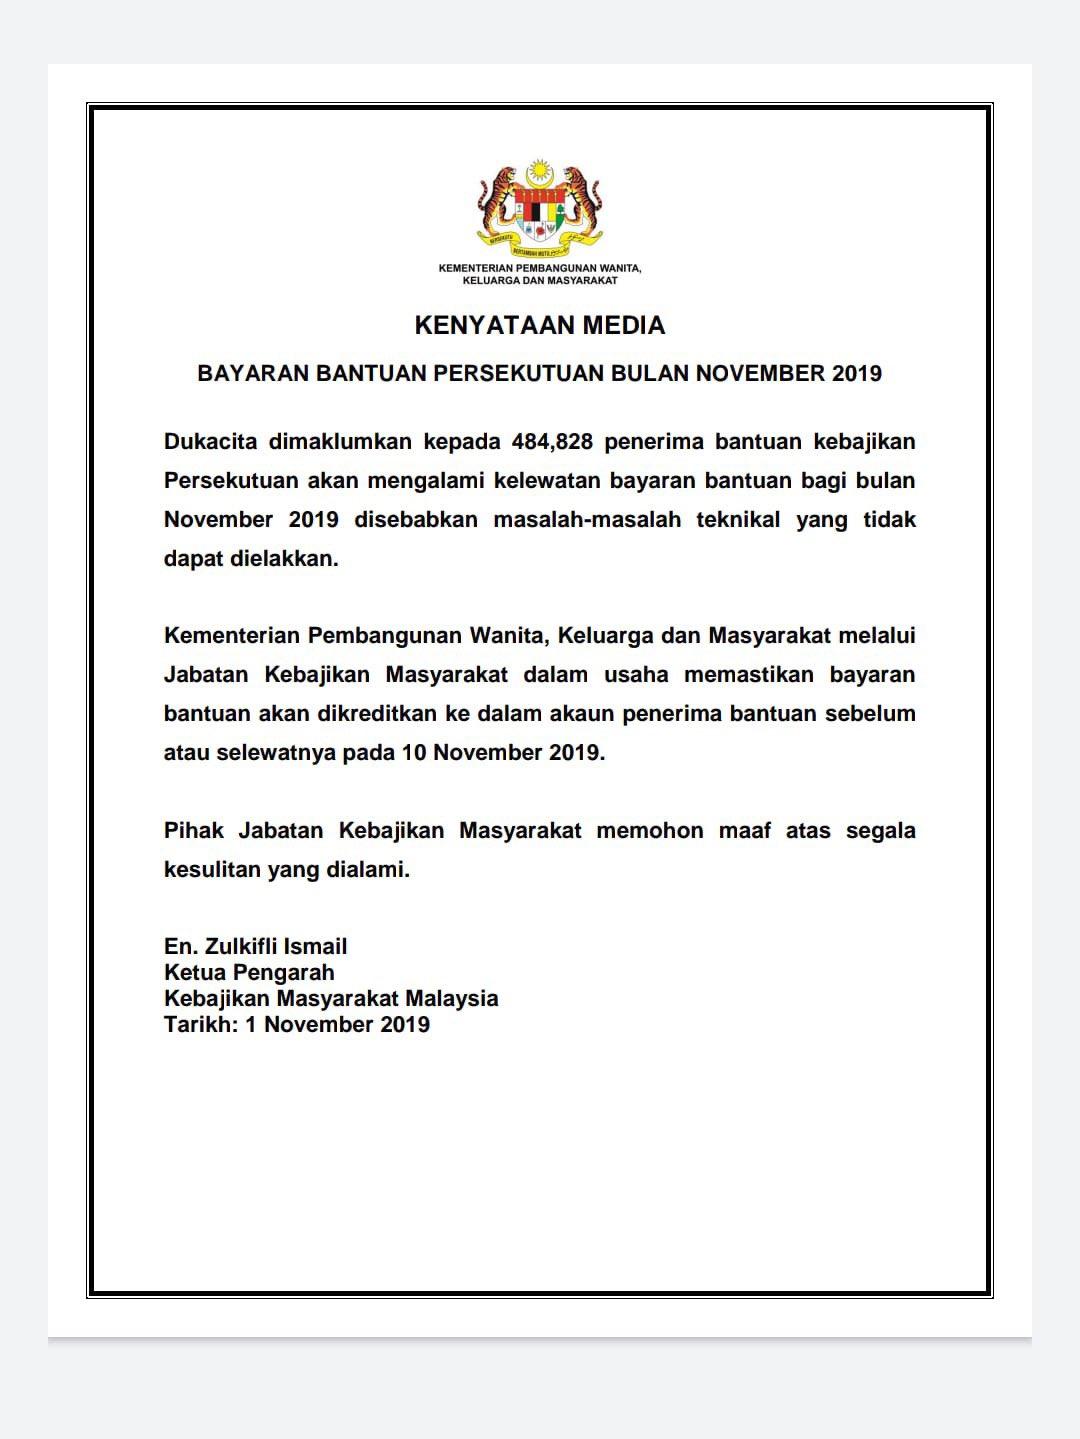 Mohon Maaf Bantuan Bulan November Lewat Kp Kebajikan Masyarakat Malaysia The Malaya Post